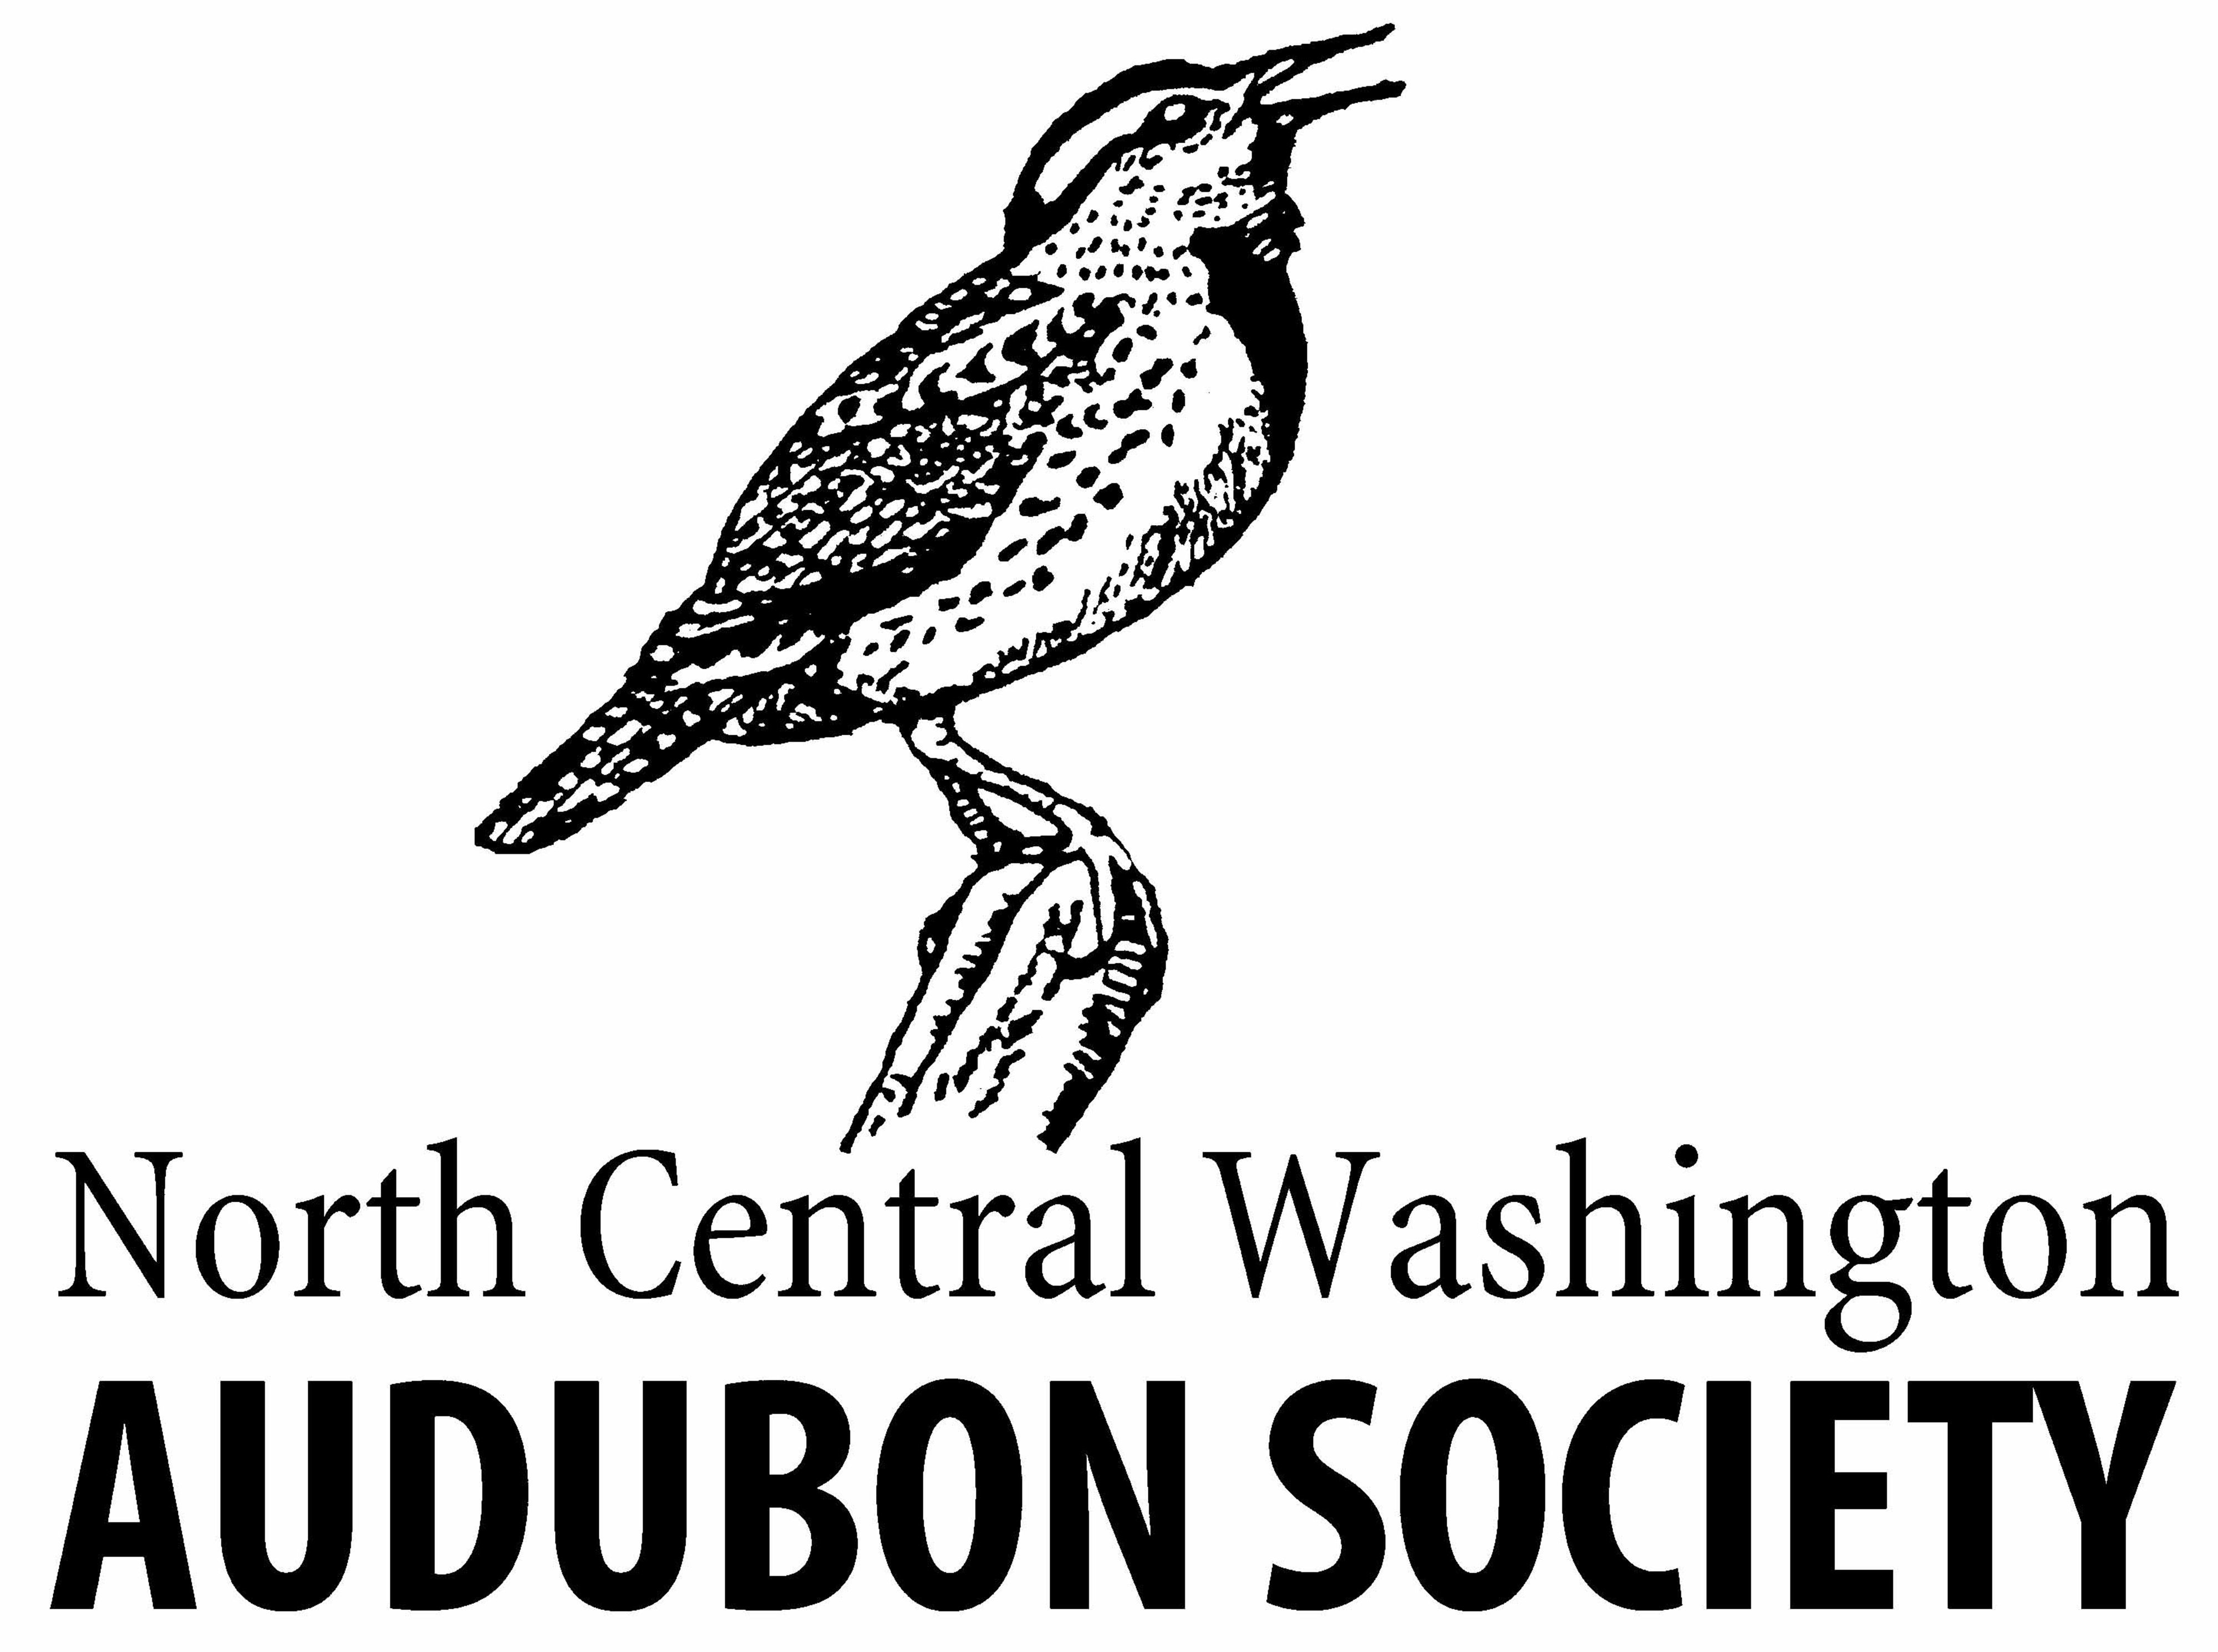 North Central Washington Audubon Society